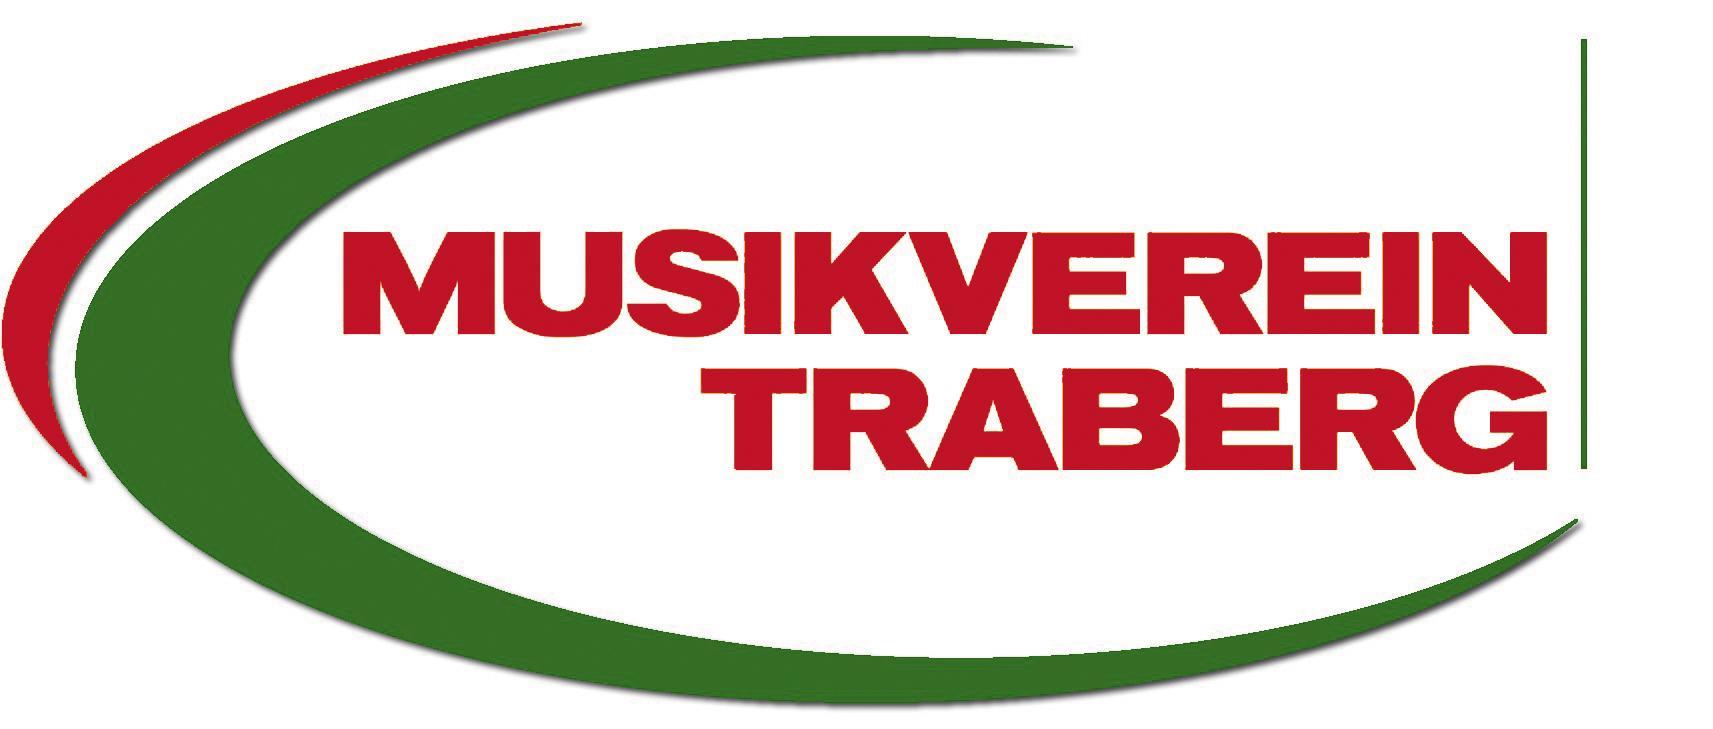 Musikverein Traberg